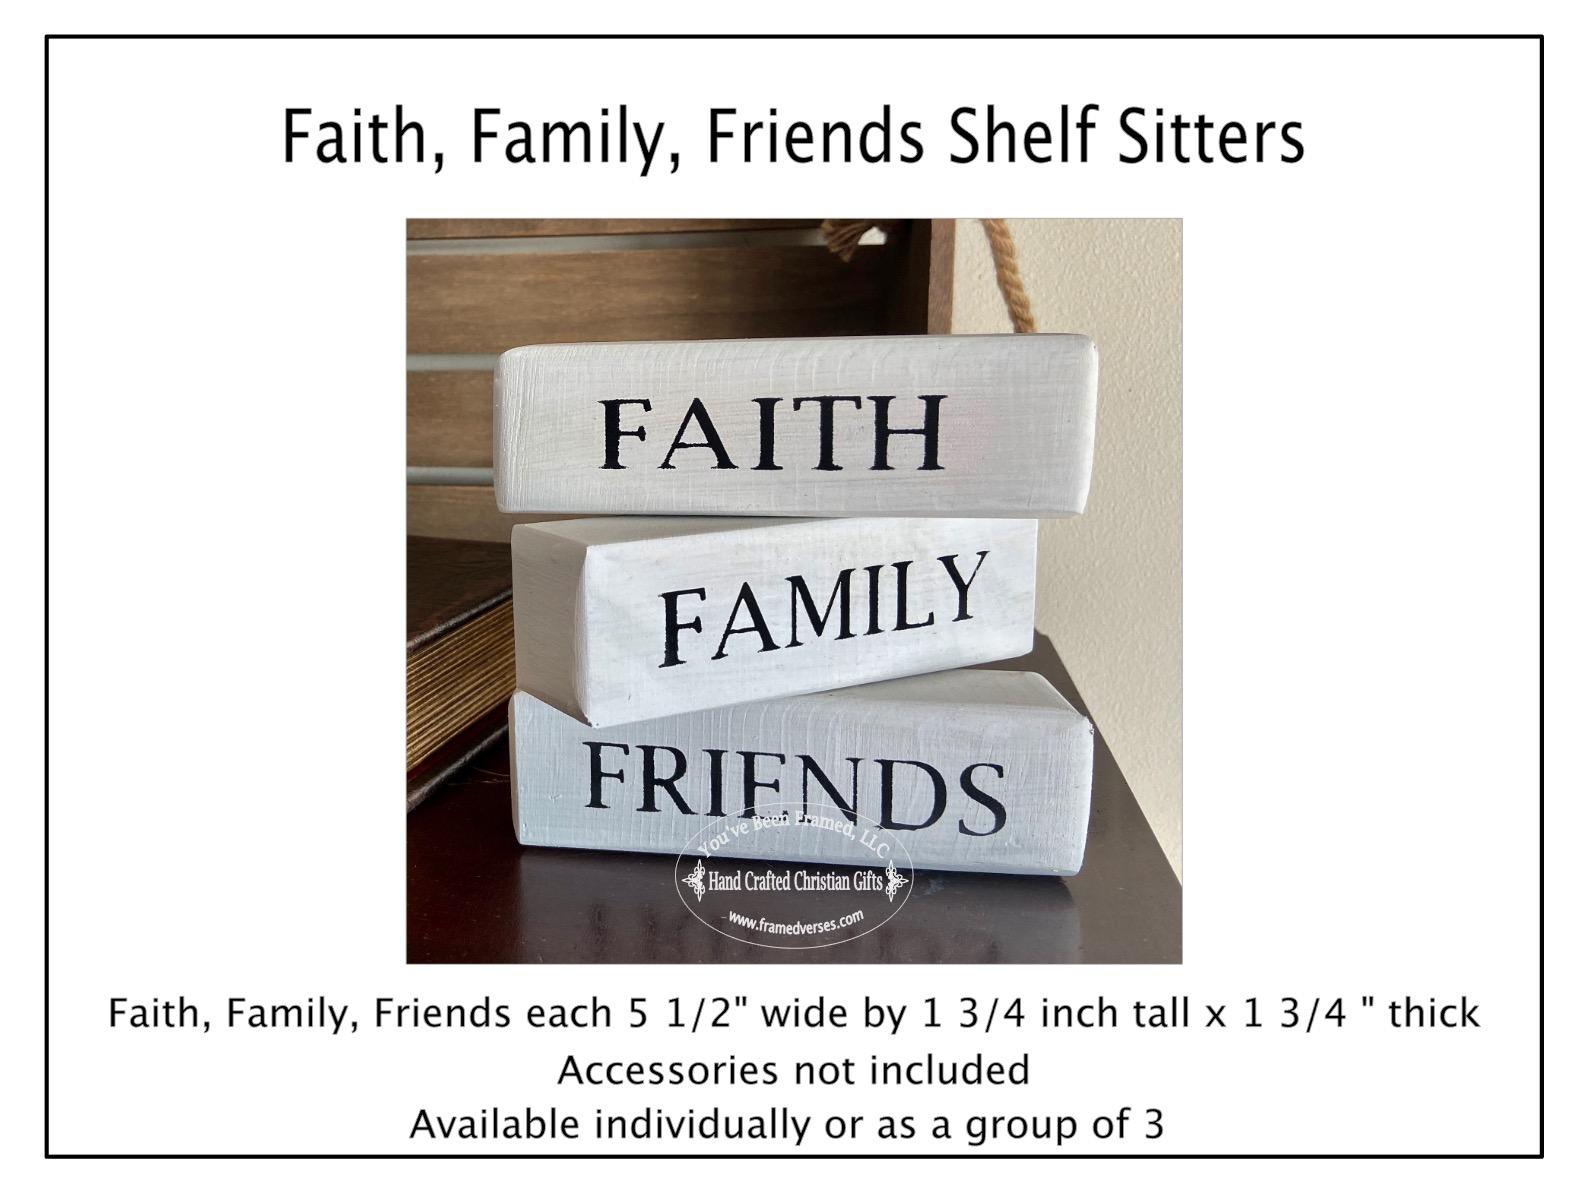 Faith Family Friends Shelf Sitters